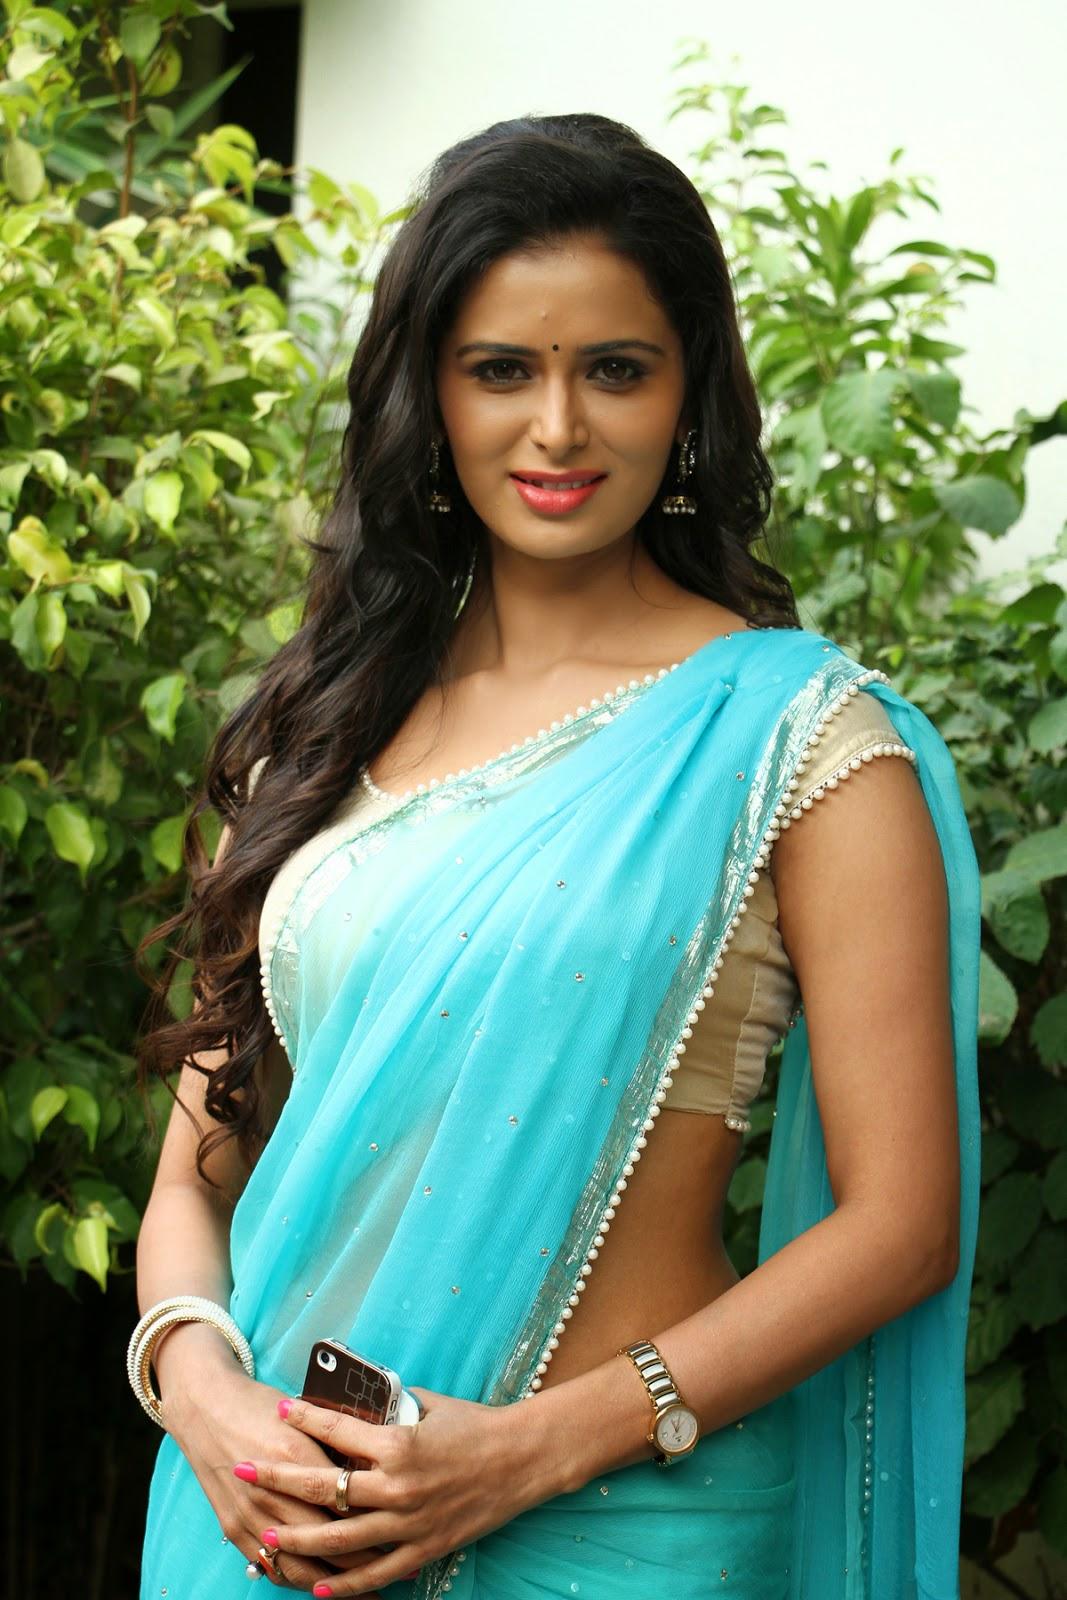 Meenakshi Dixit Hot Photos | Filmy Trend